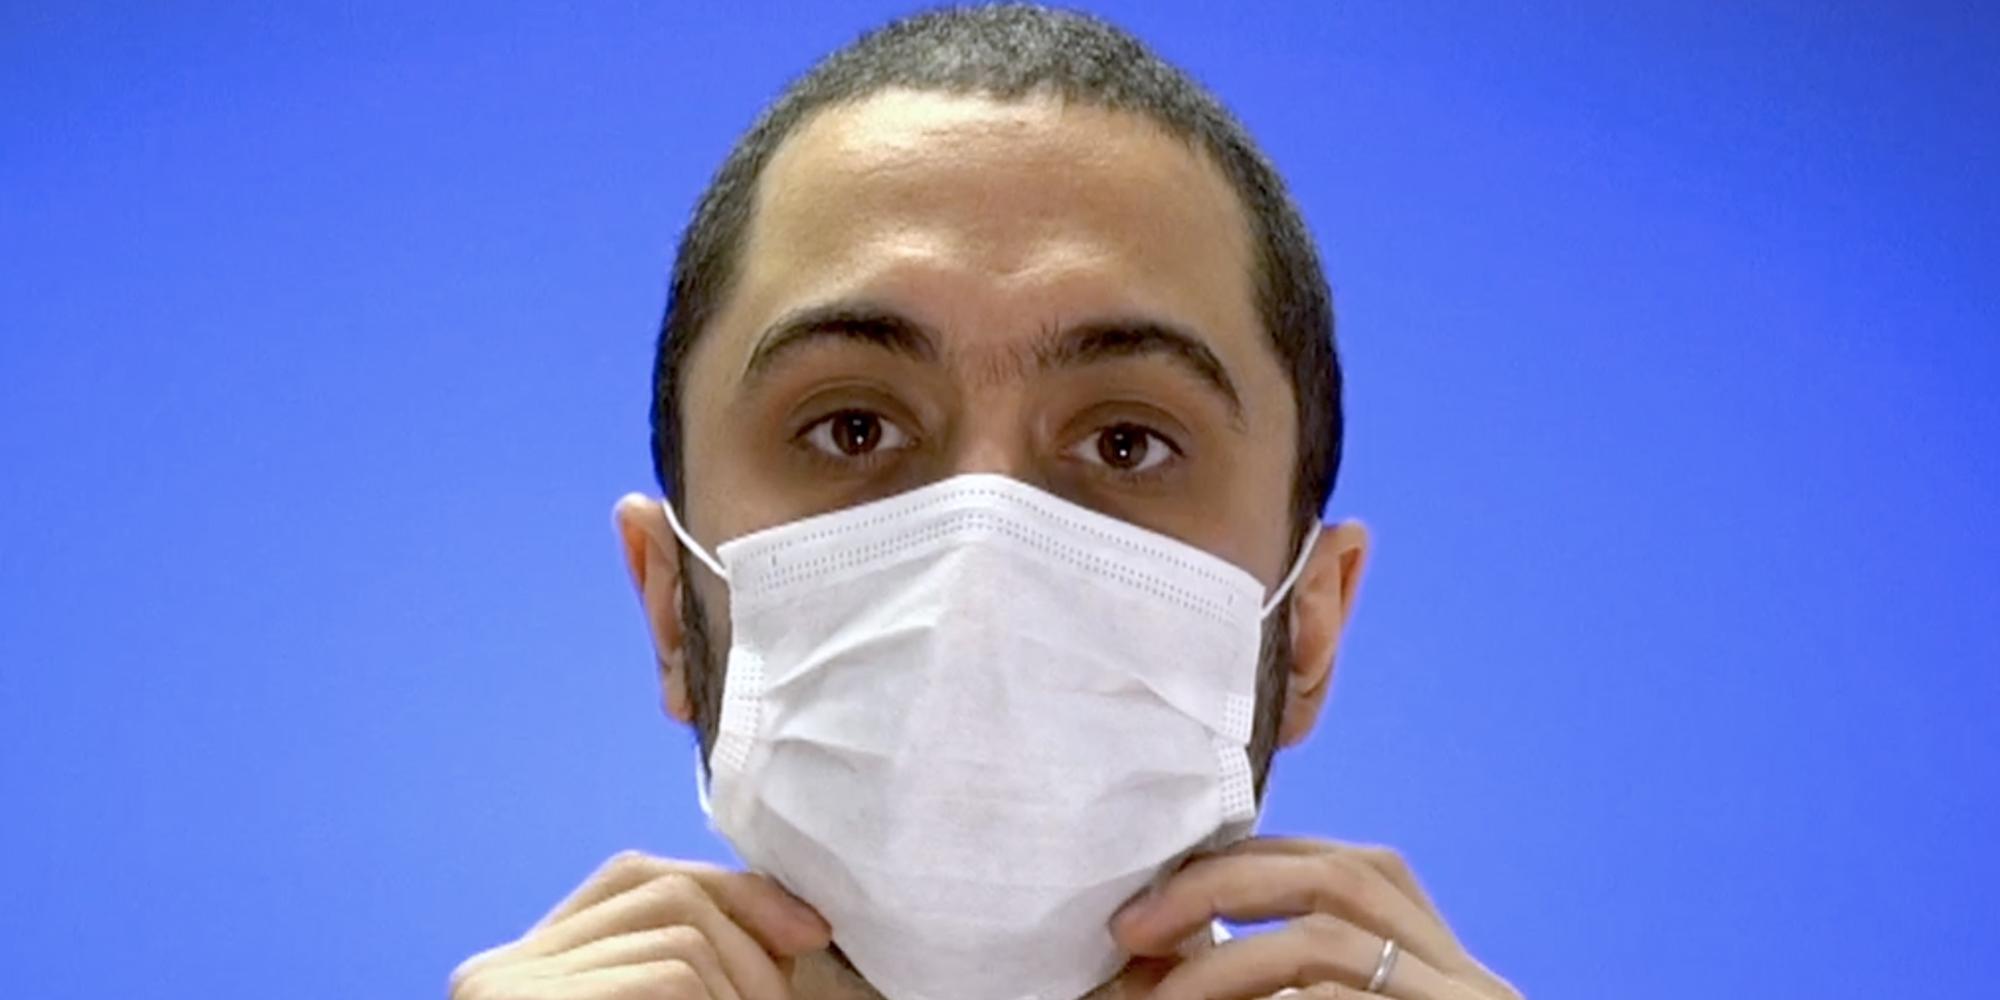 masque contre virus france